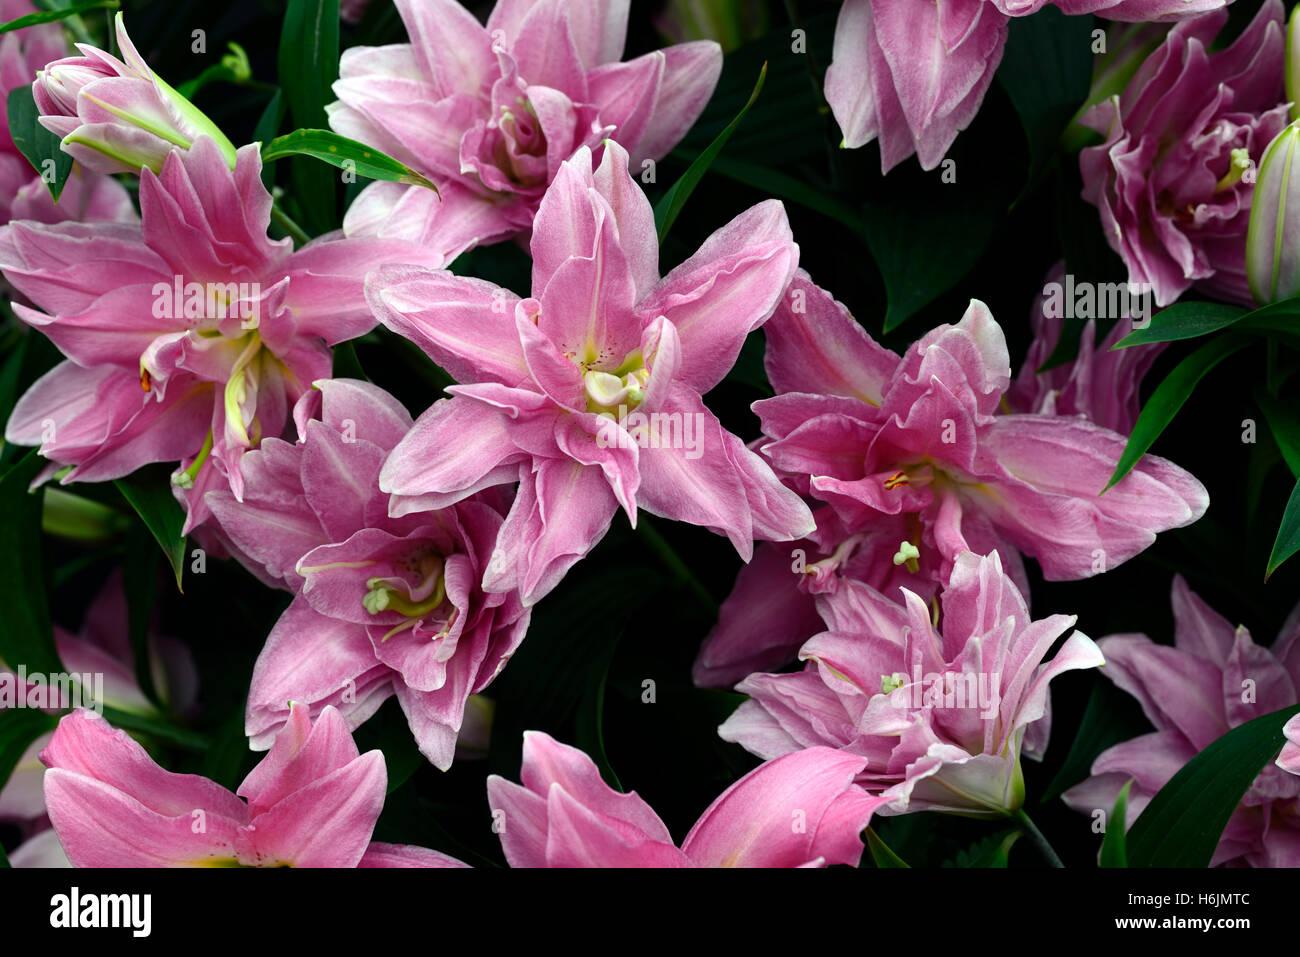 Lilium double surprise pink flower flowers scent scented fragrant lilium double surprise pink flower flowers scent scented fragrant oriental trumpet hybrids orienpet ot rm floral mightylinksfo